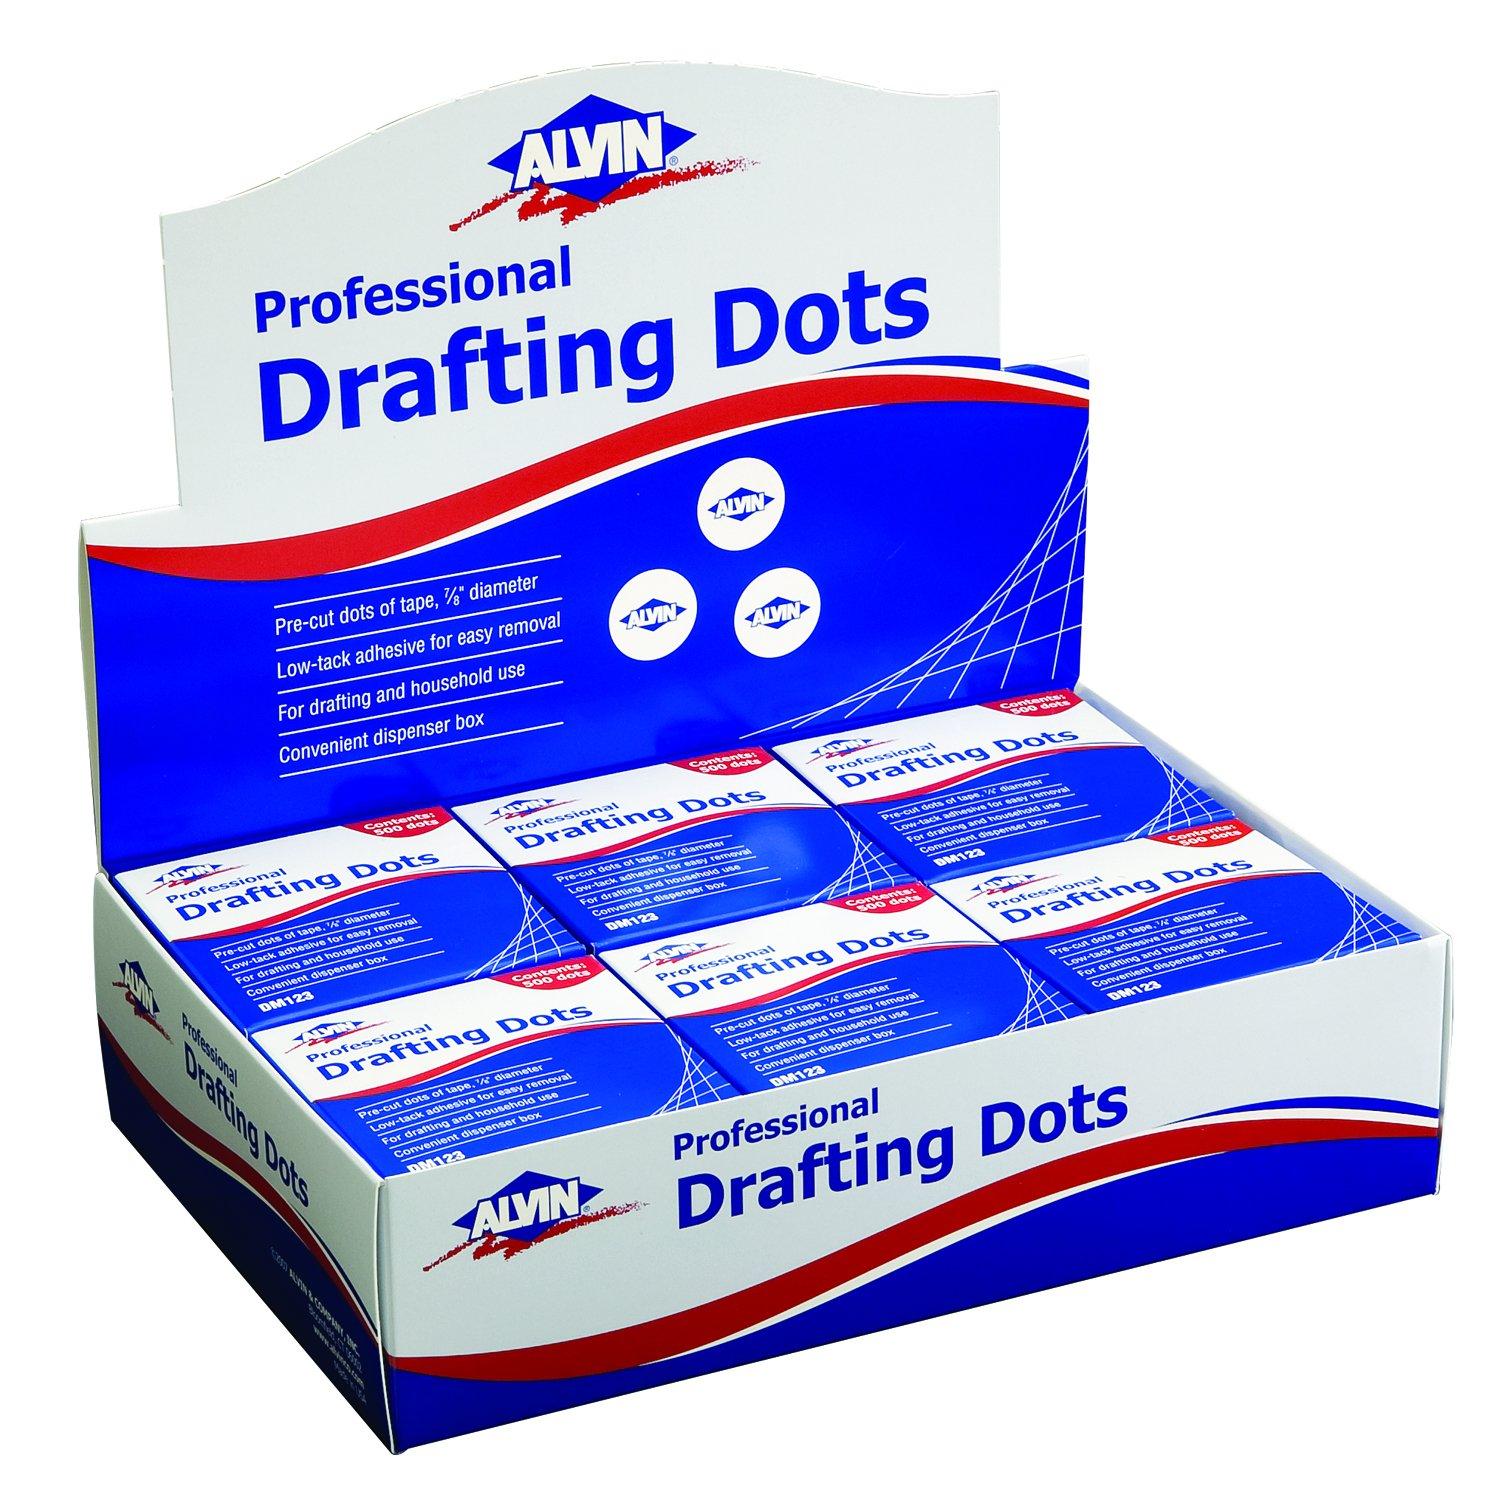 Alvin DM123D Drafting Dots Display